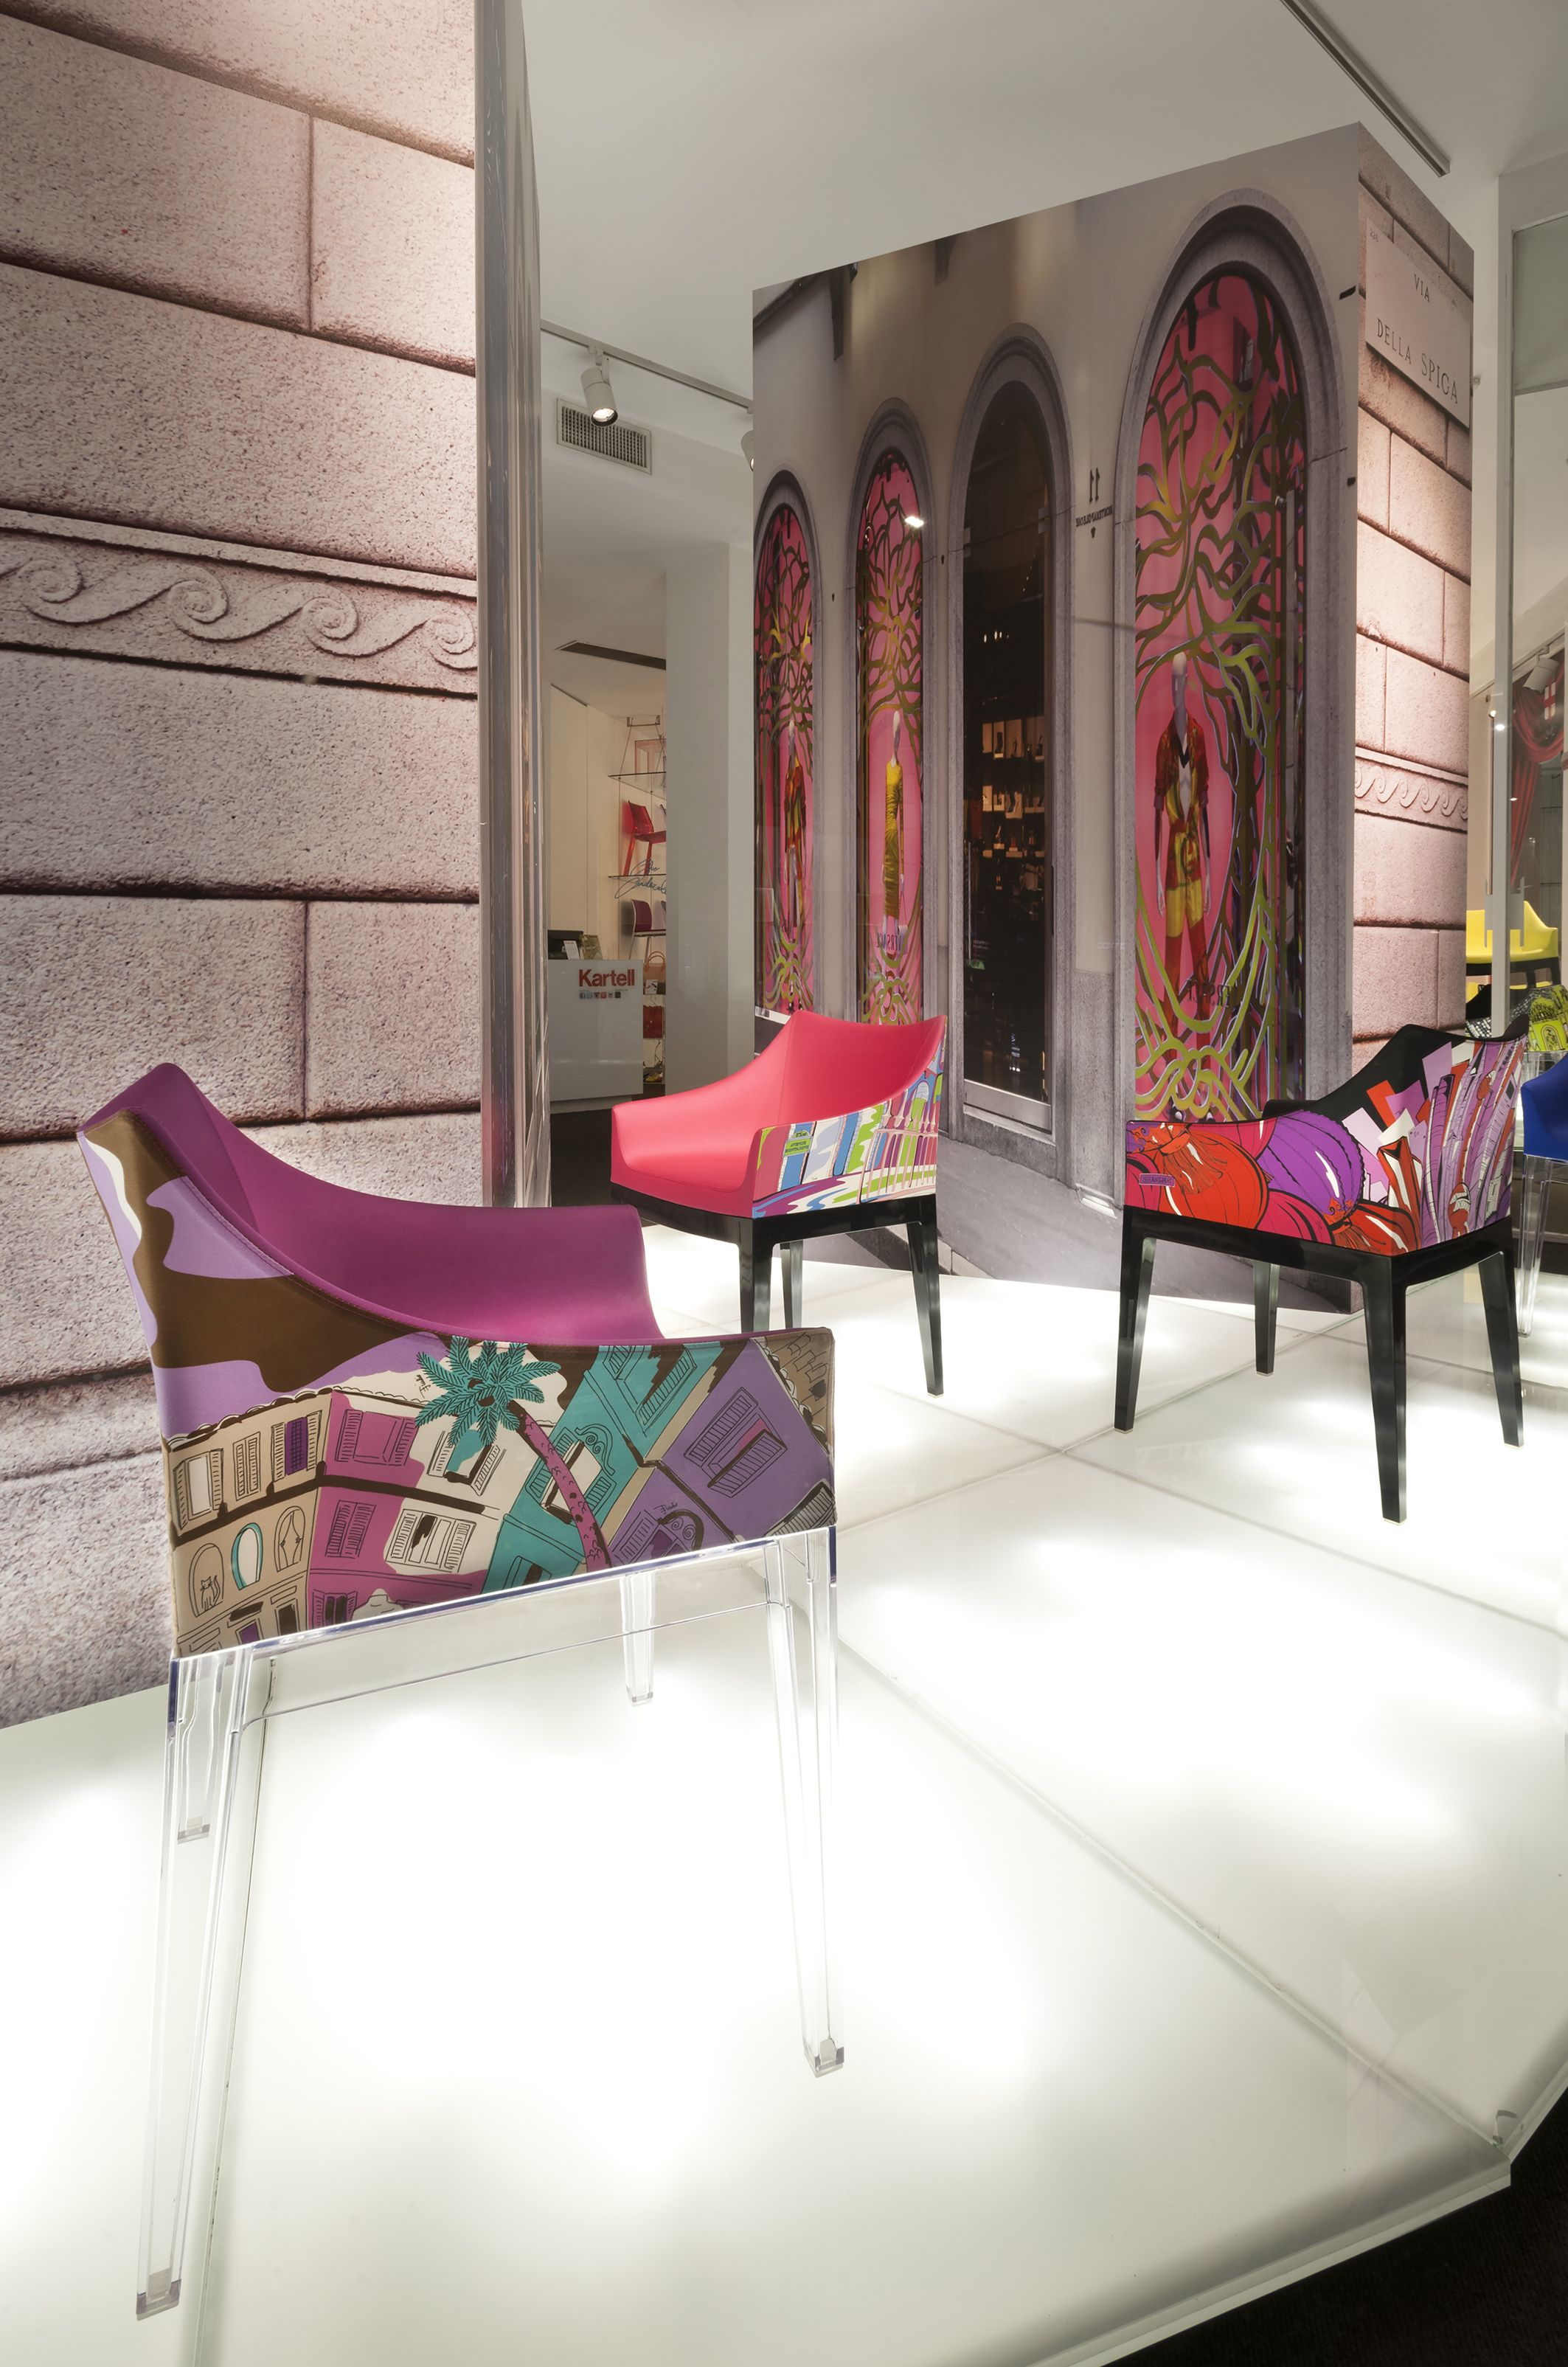 Madame world of emilio pucci edition design philippe starck objet deco moderne art